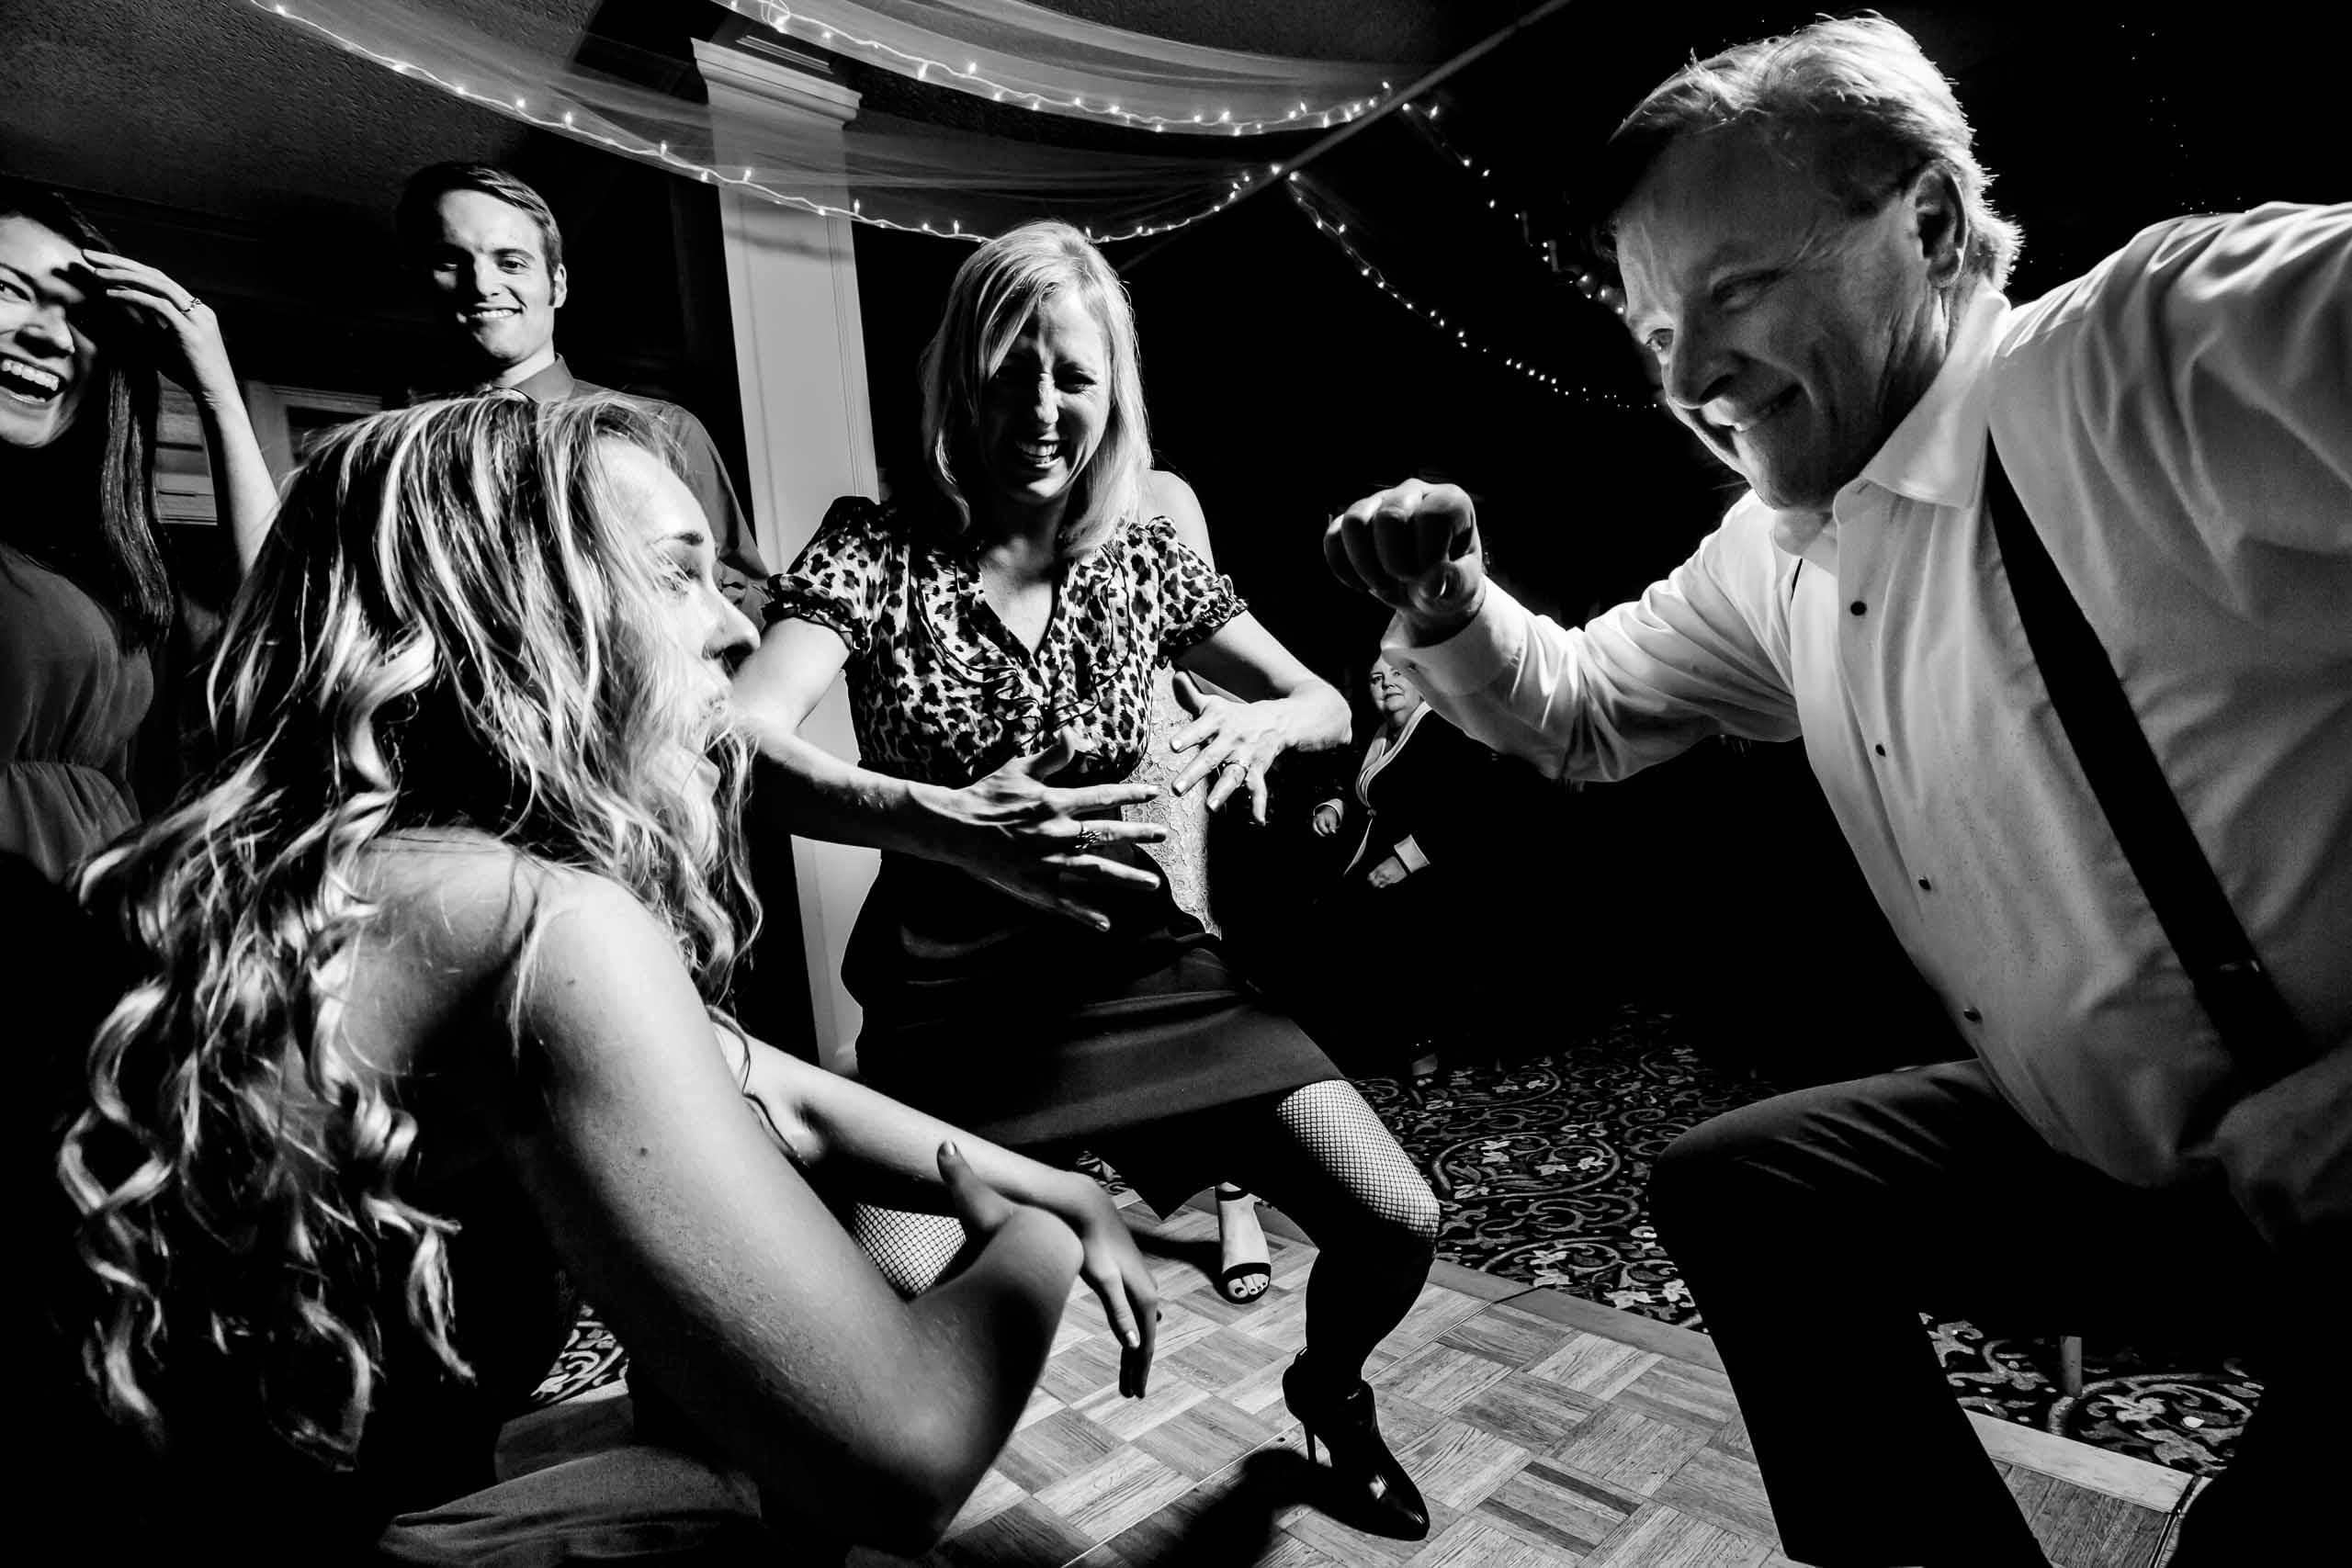 Crazy fun dance photo at a Columbia Gorge Hotel Wedding reception